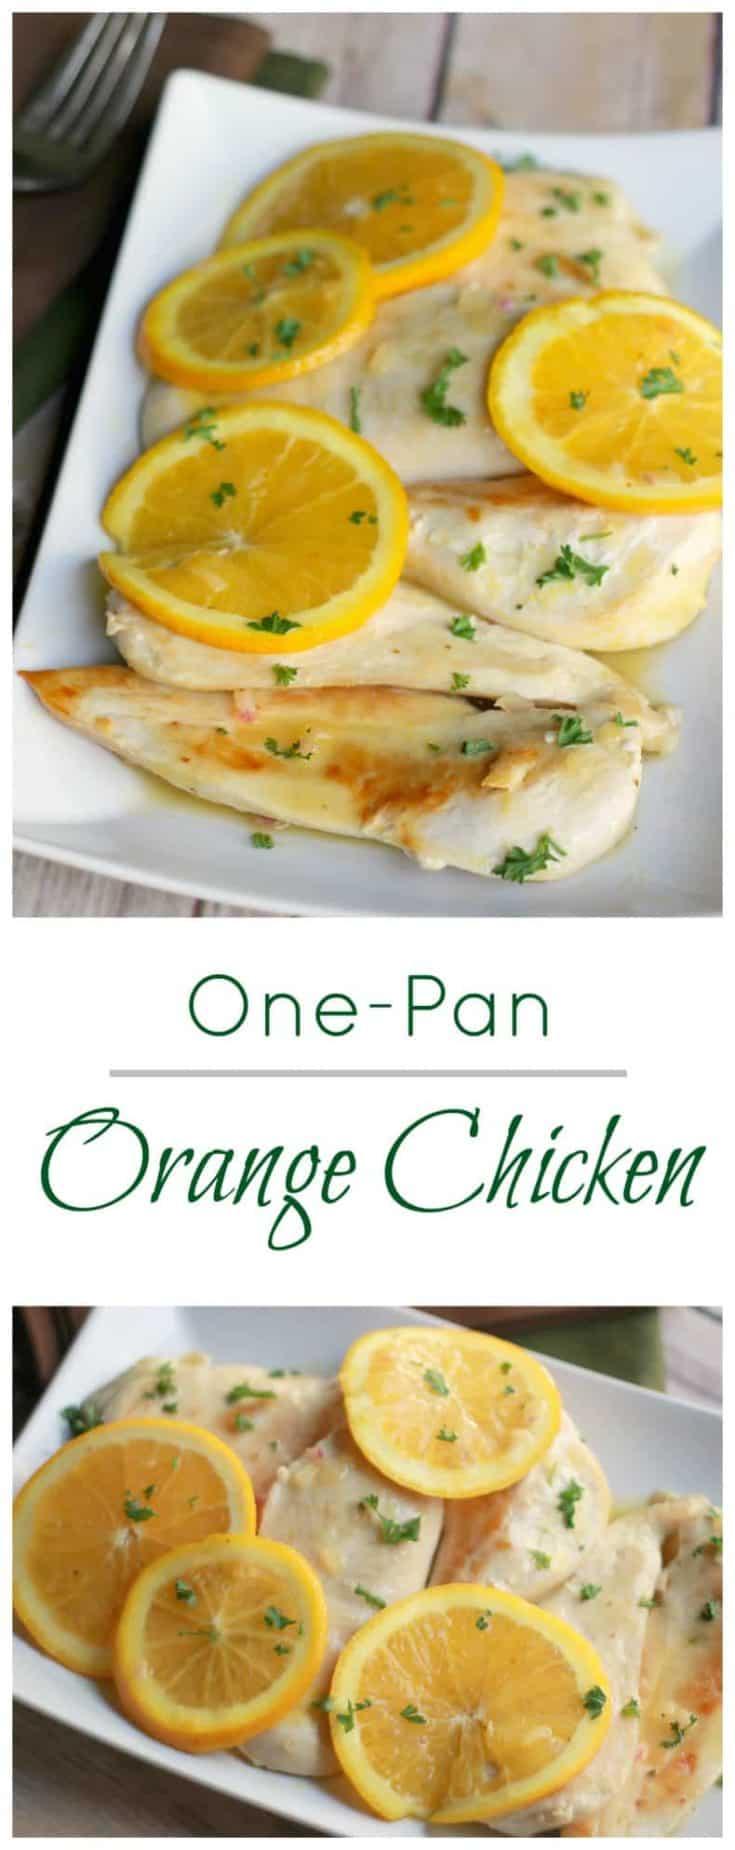 Not only is this One-Pan Orange Chicken a 30-Minute Easy Dinner, yet it's one that requires few ingredients. #chickenrecipe #orangechicken